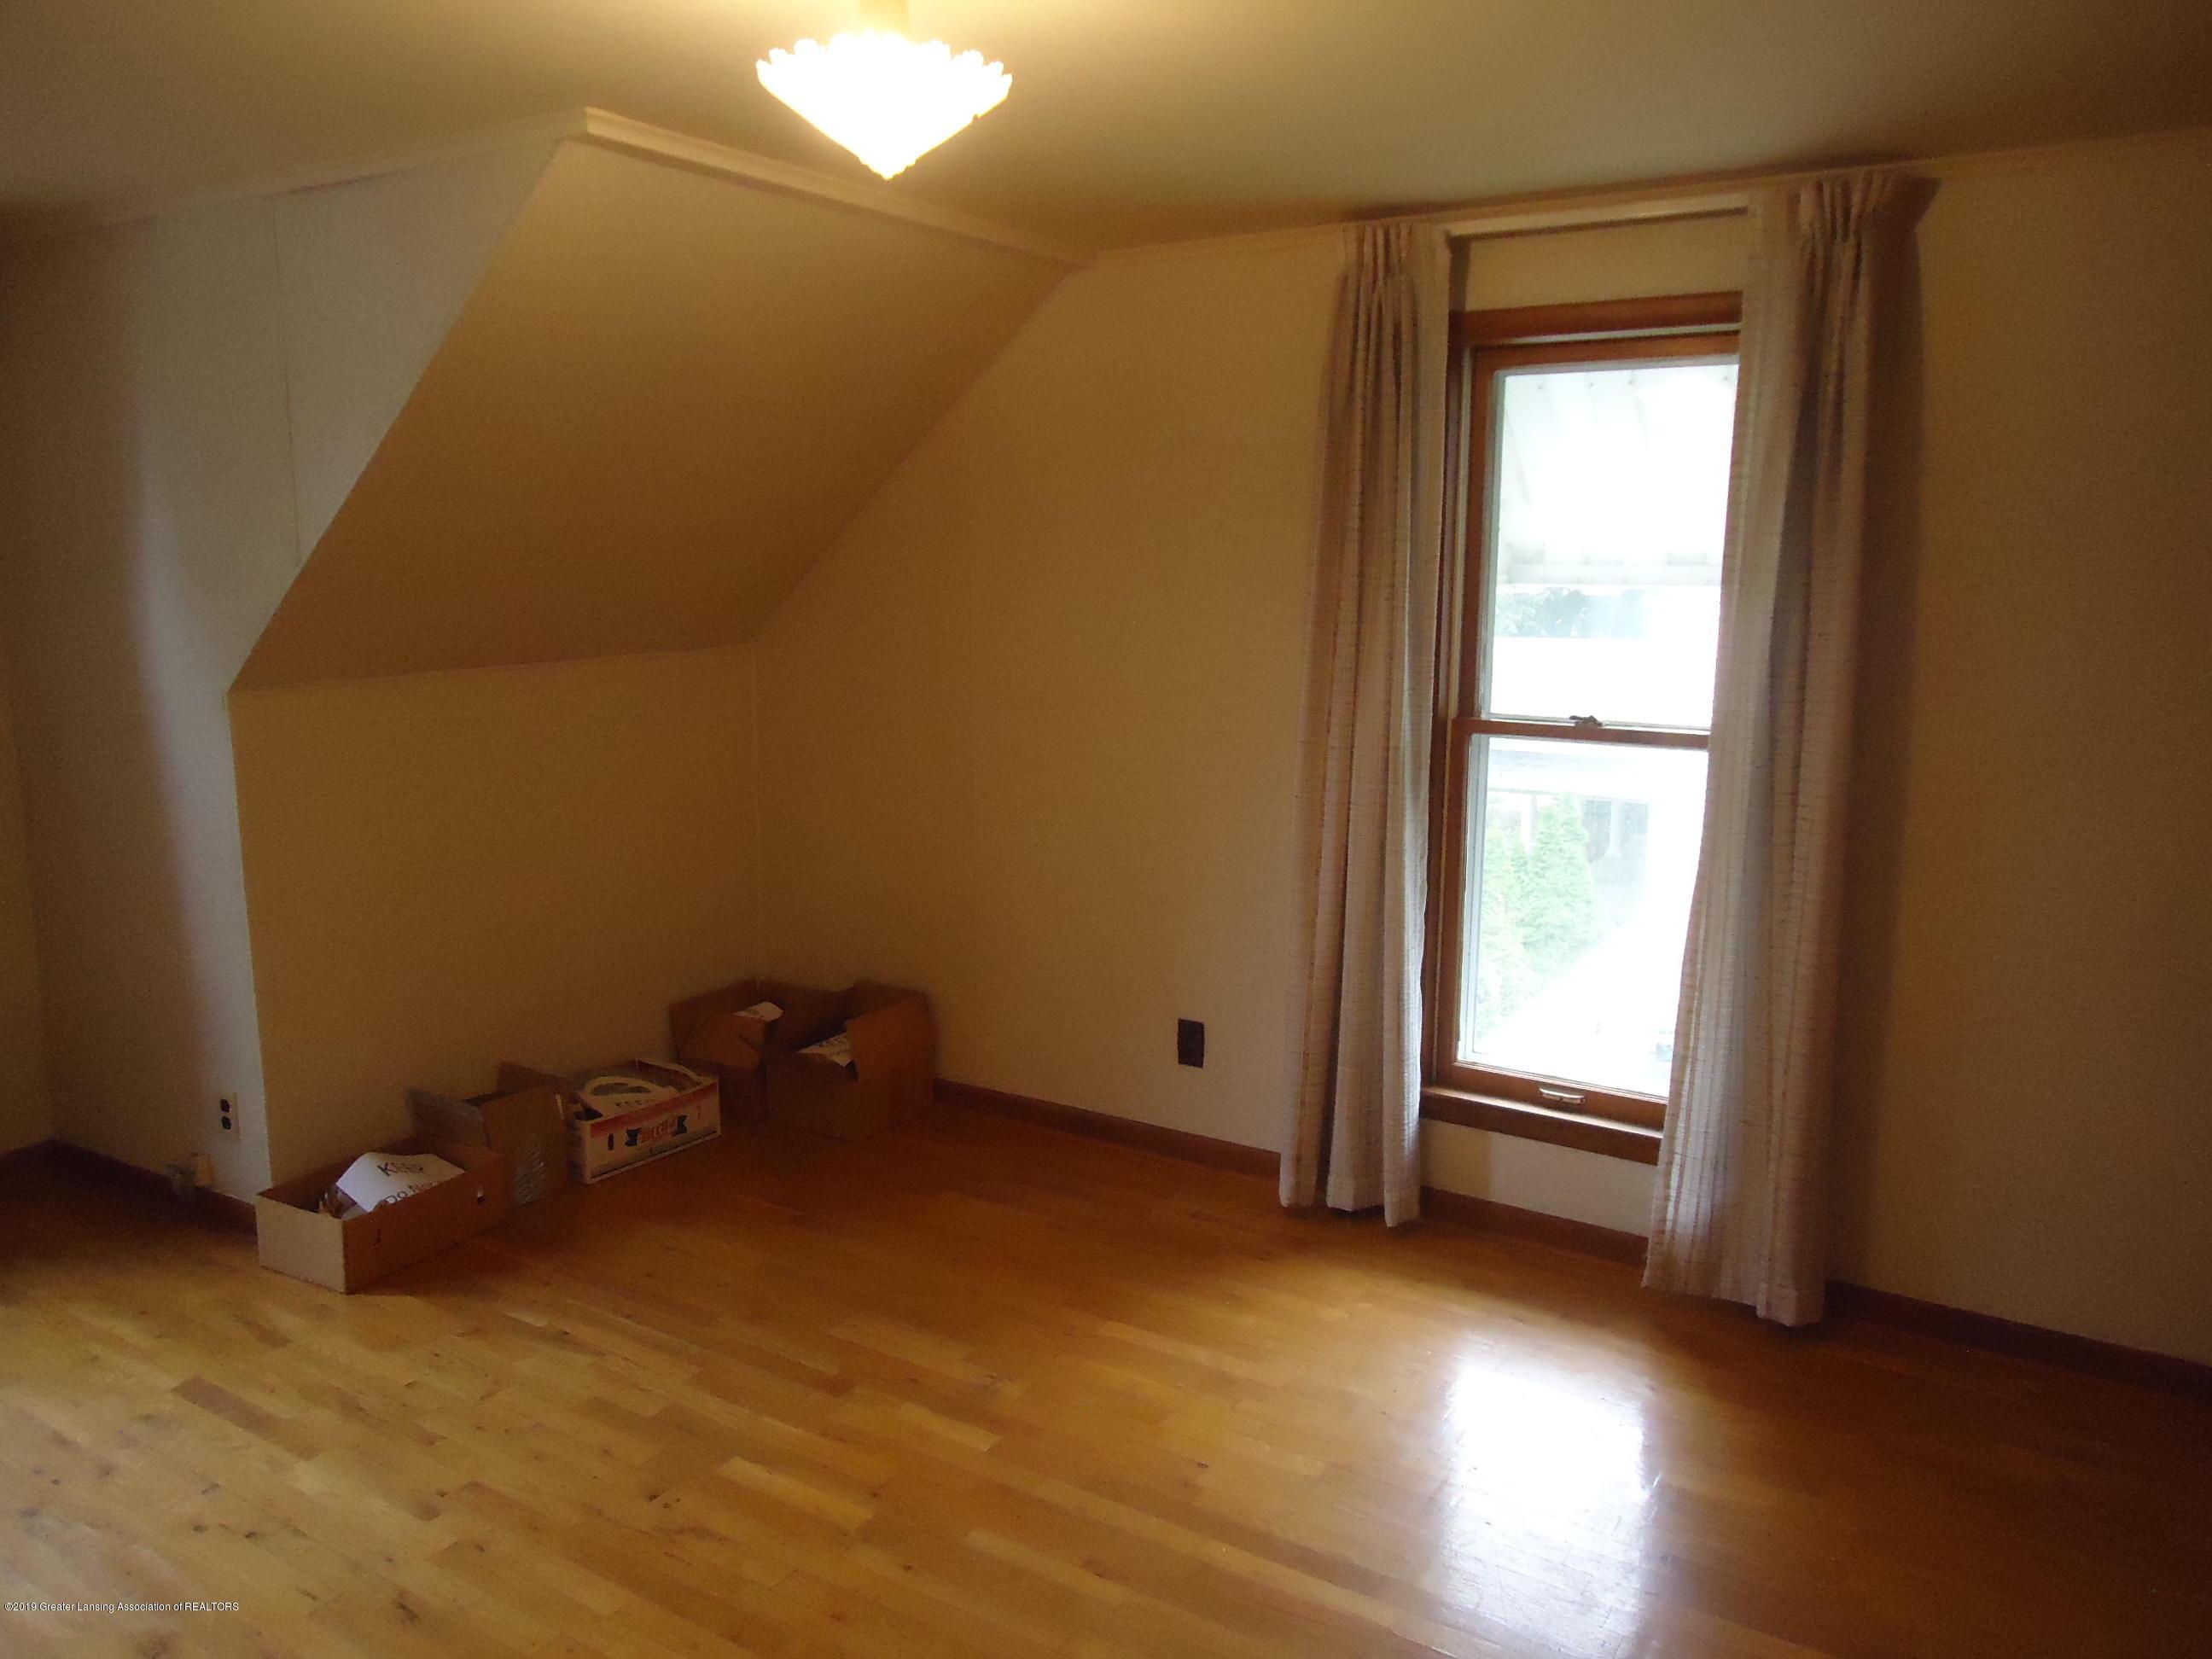 309 E Lovett St - 14 Bedroom 1 (2) - 10